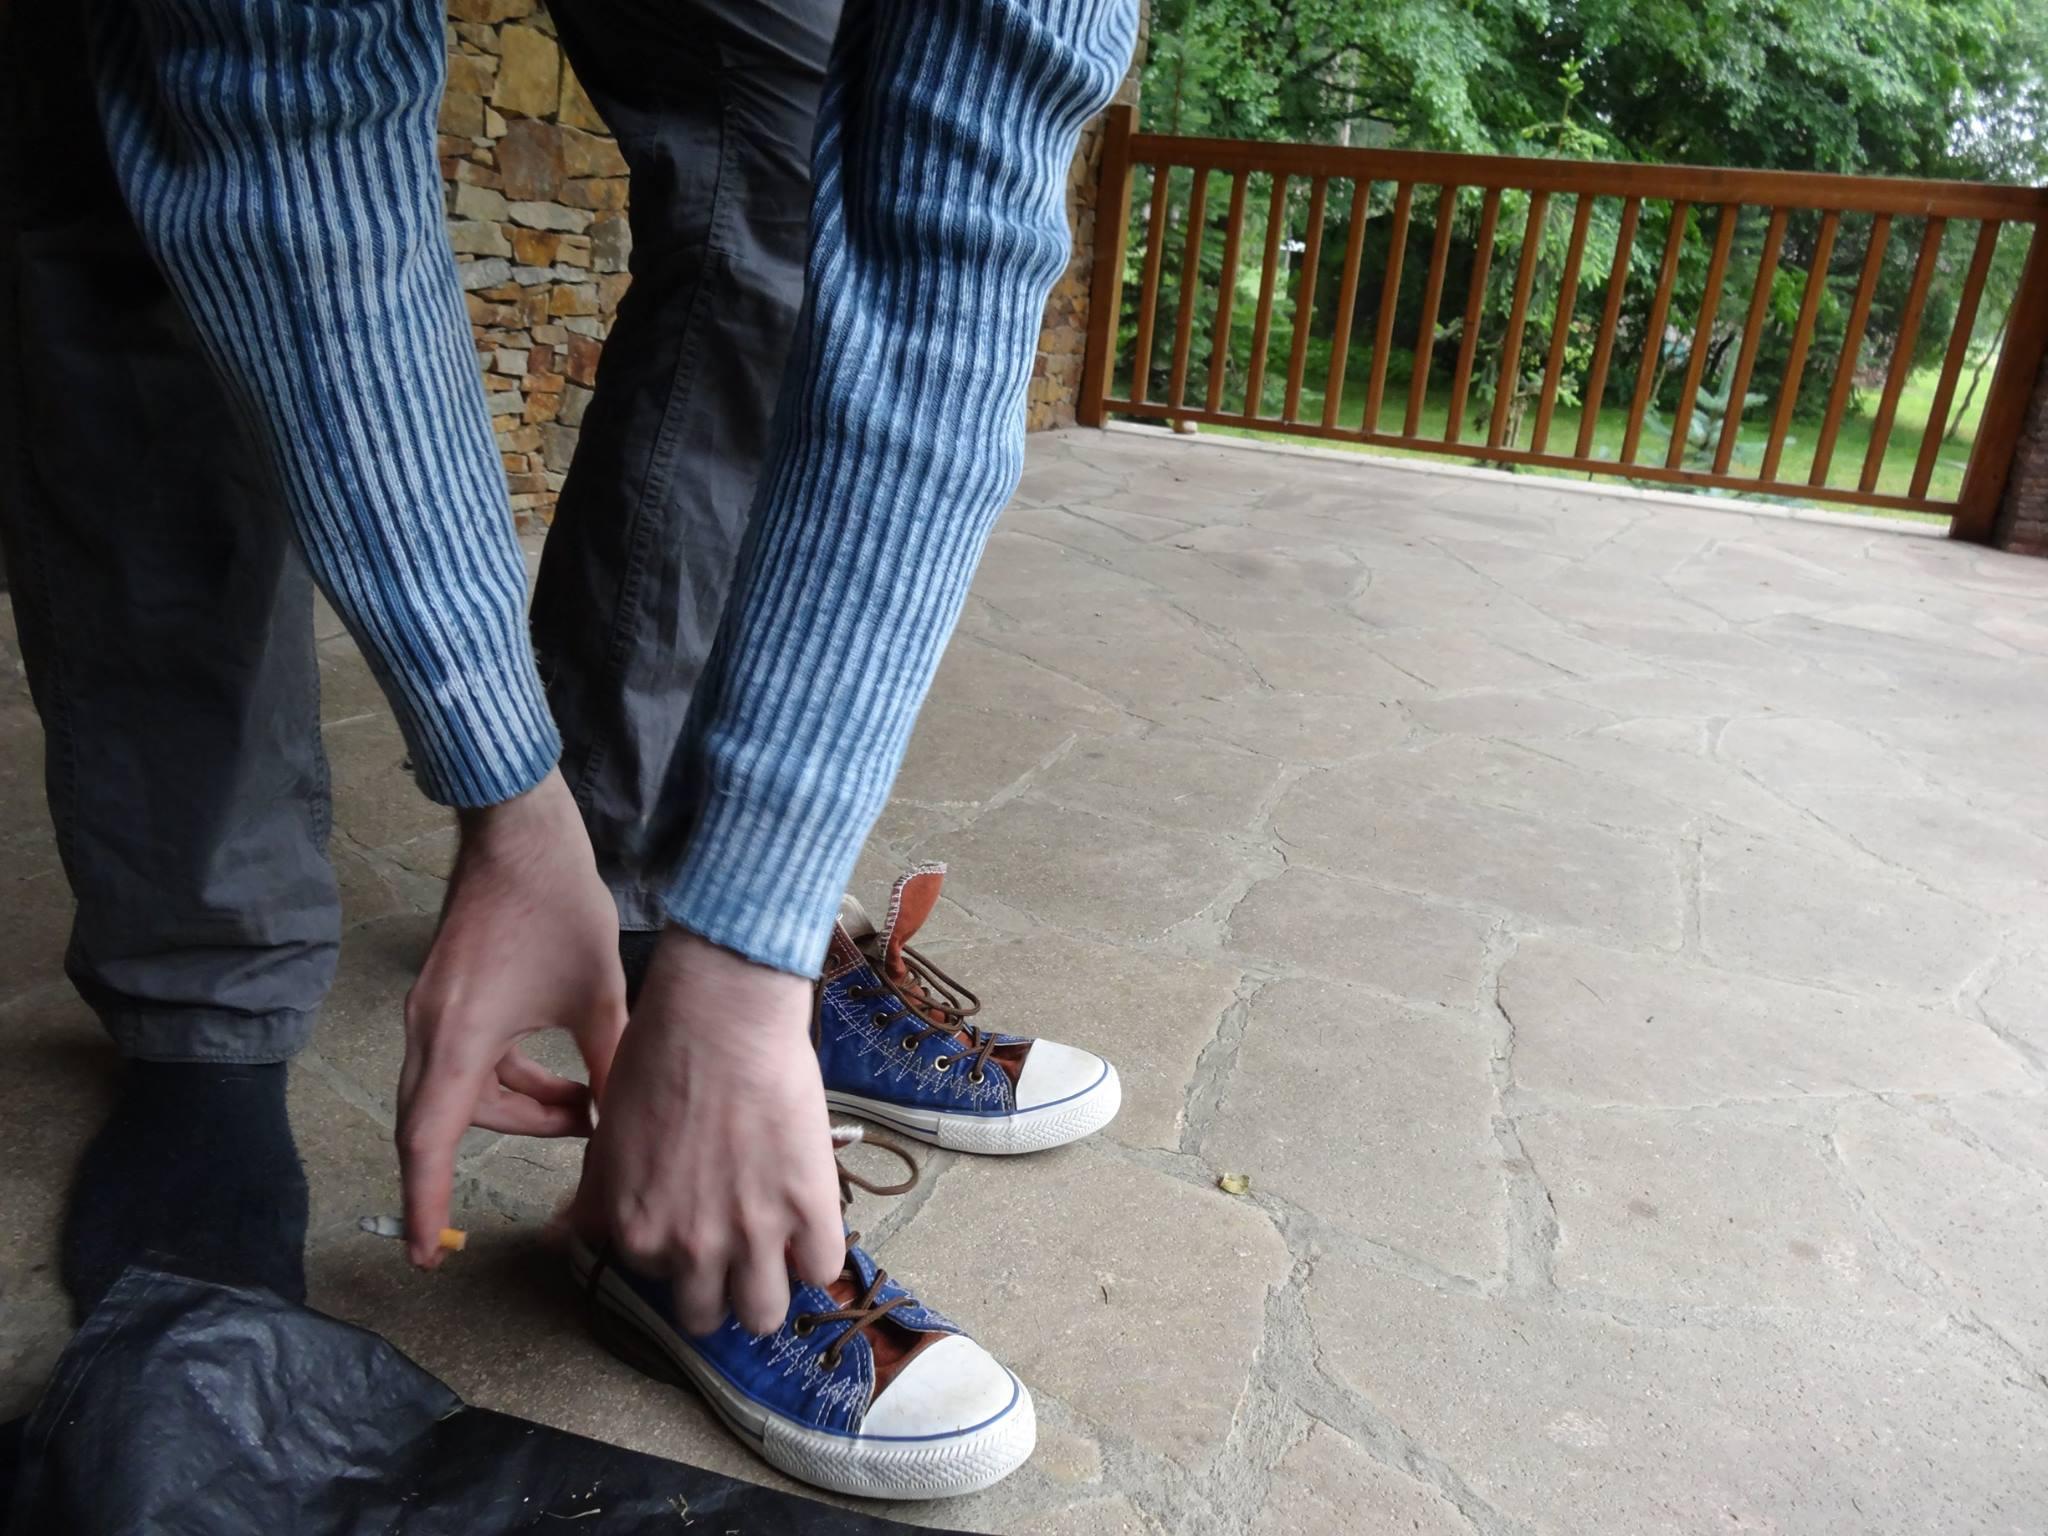 tiny shoes francois hokonono hikaru tenshin